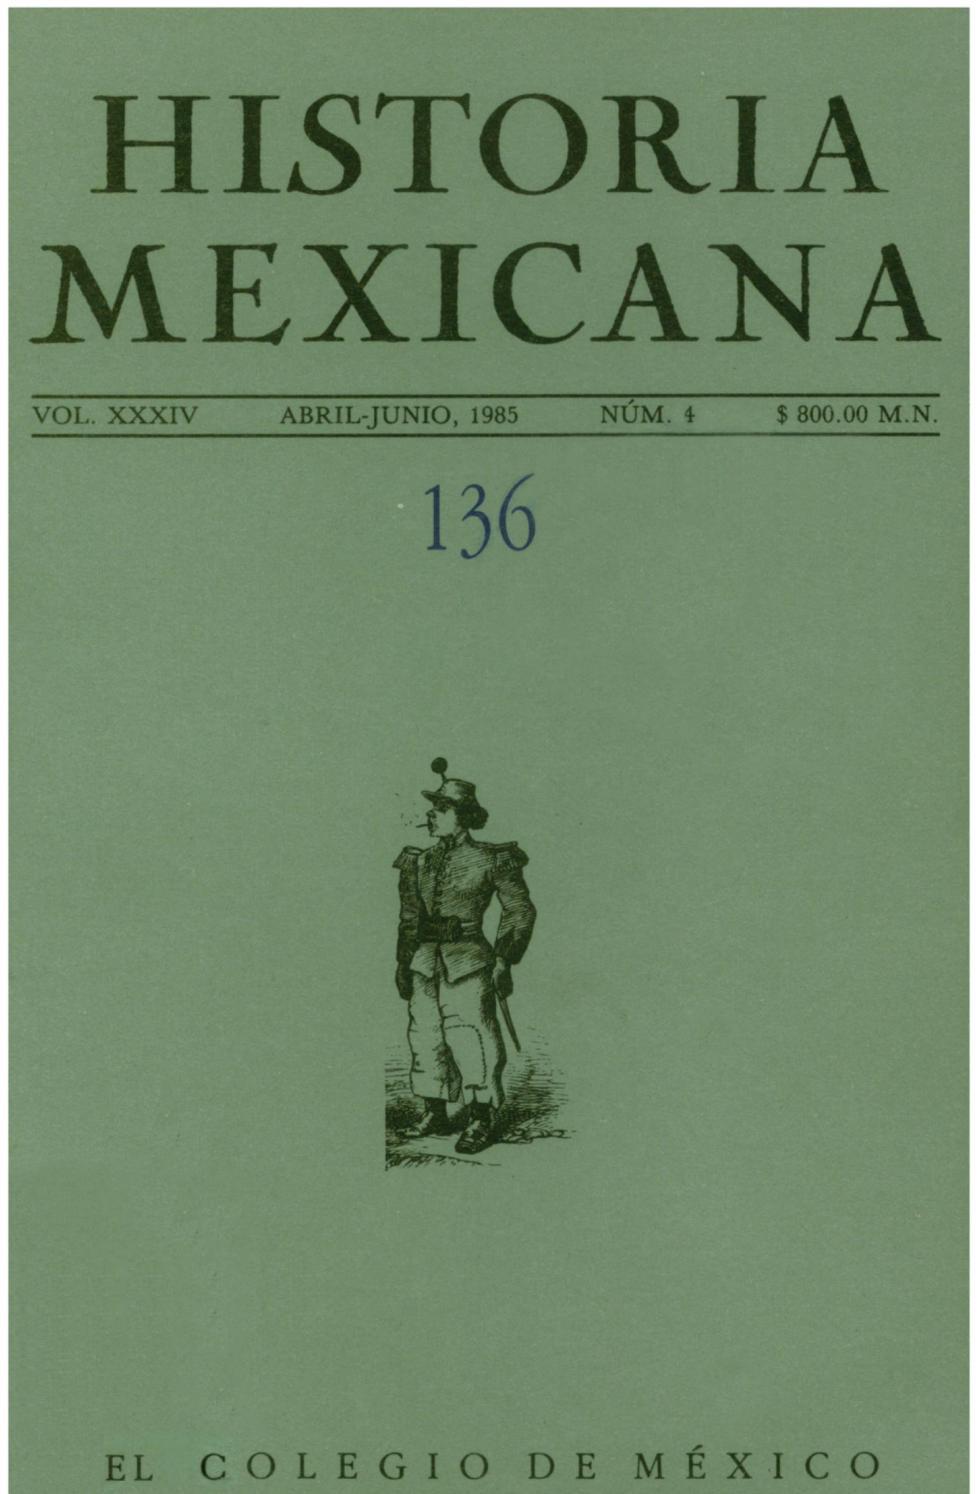 Historia mexicana 136 volumen 34 número 4 by Ce Ocelotl - issuu